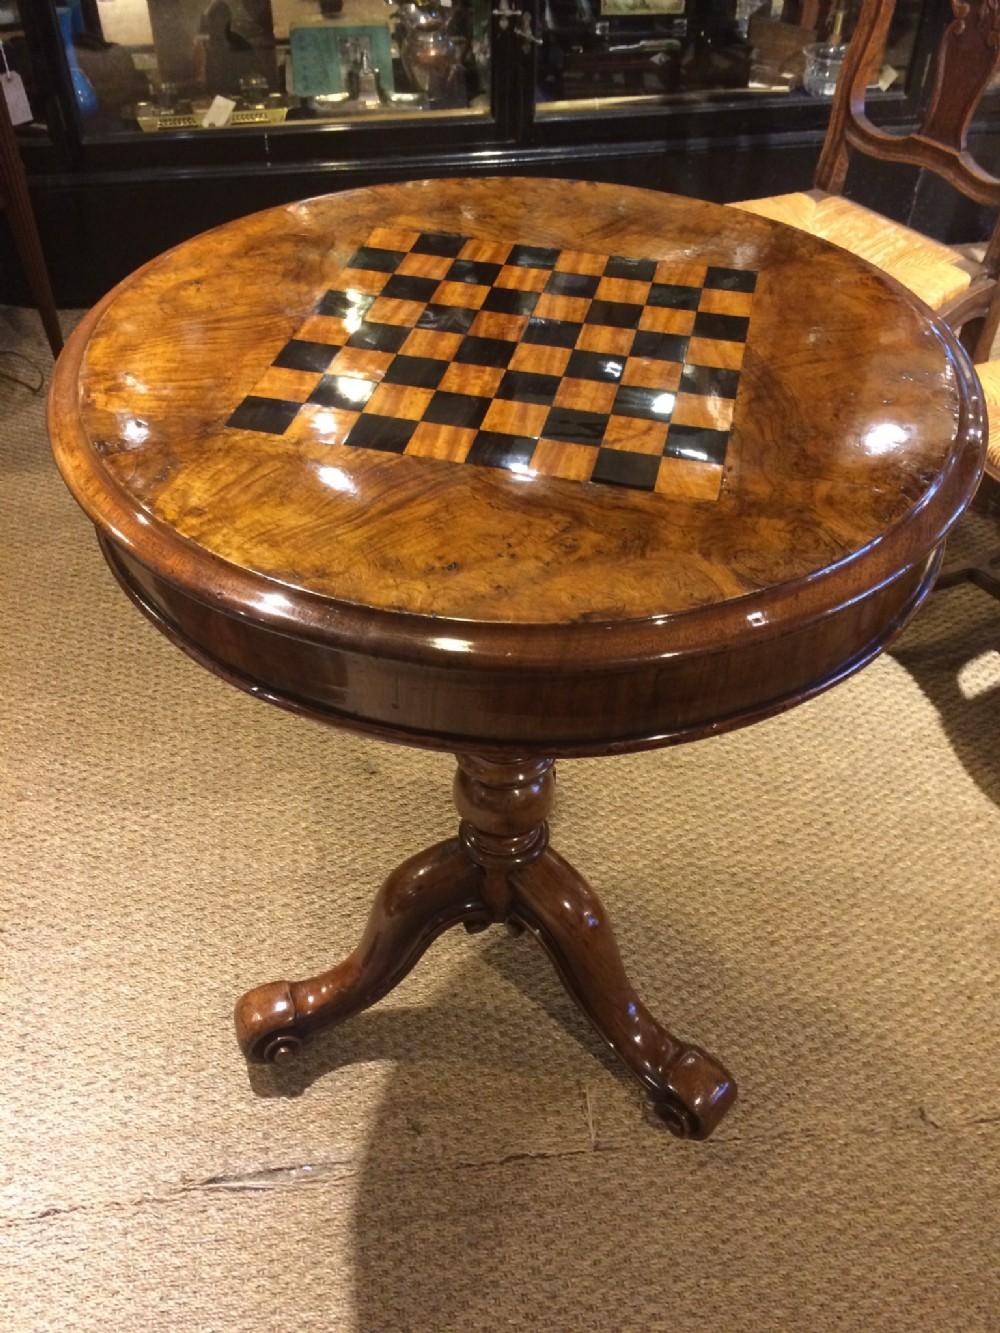 wilson patent metamorphic games chess table